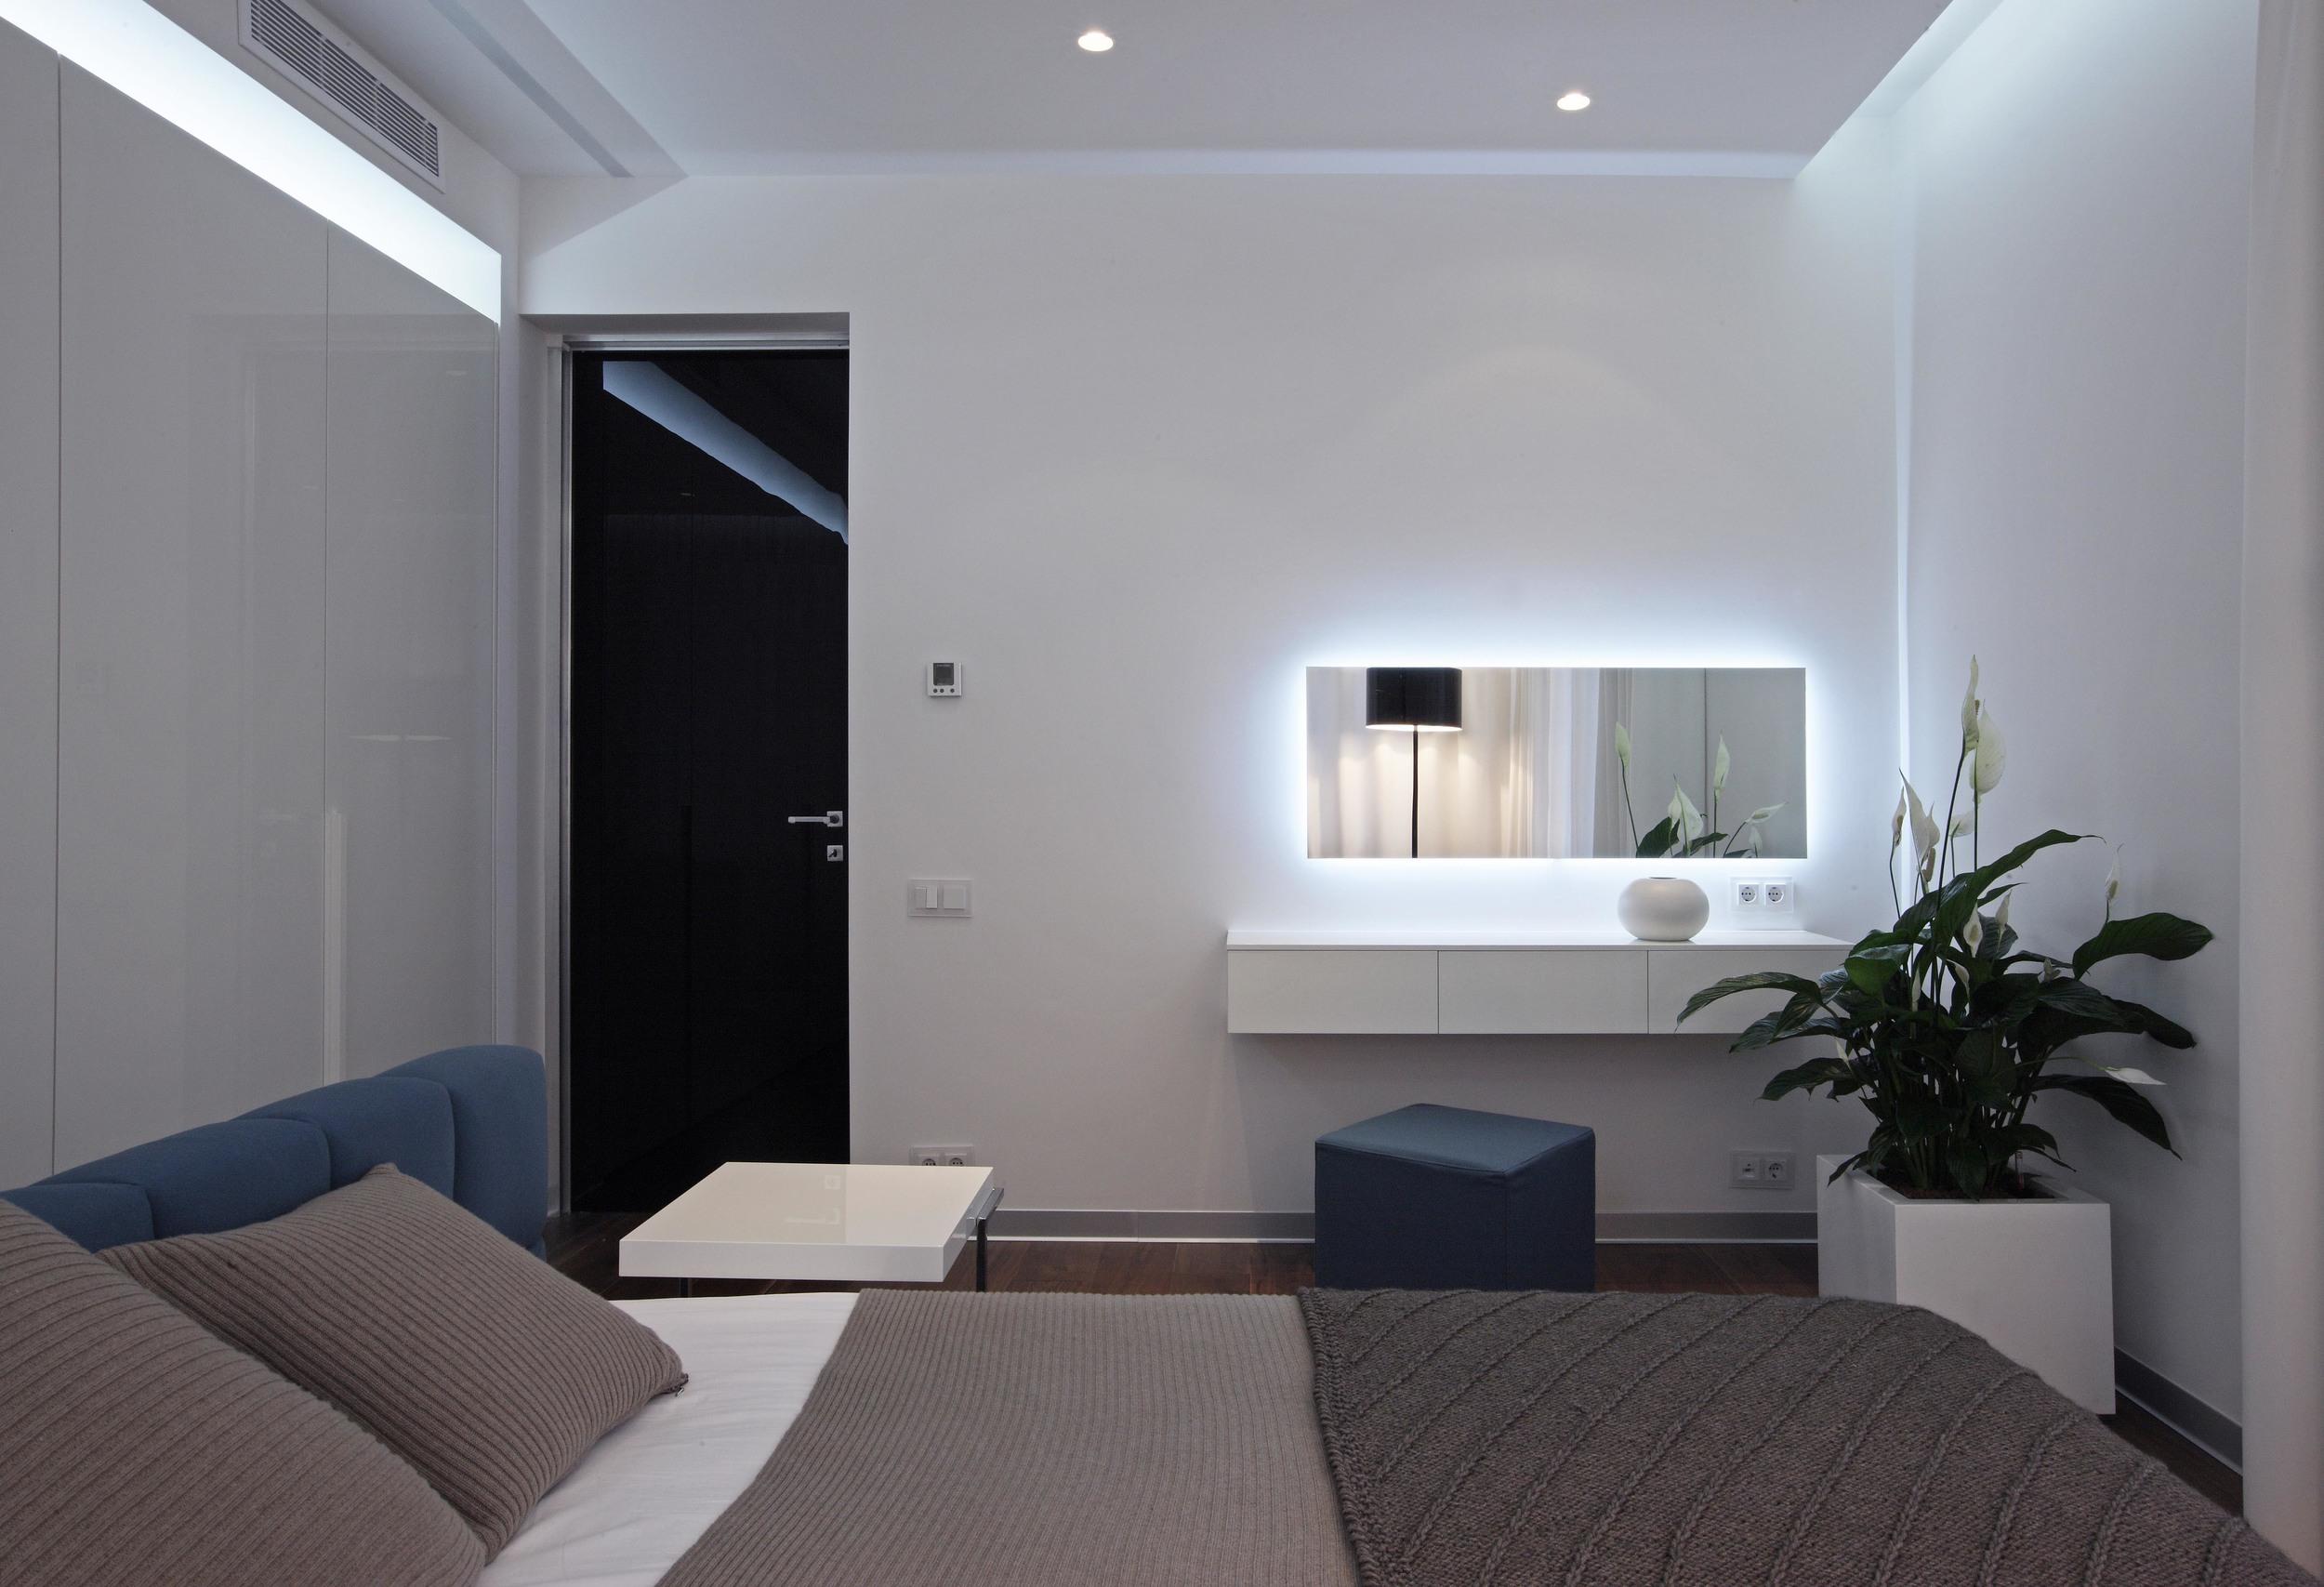 11_ub_pechatnikov3_bedroom_2.jpg